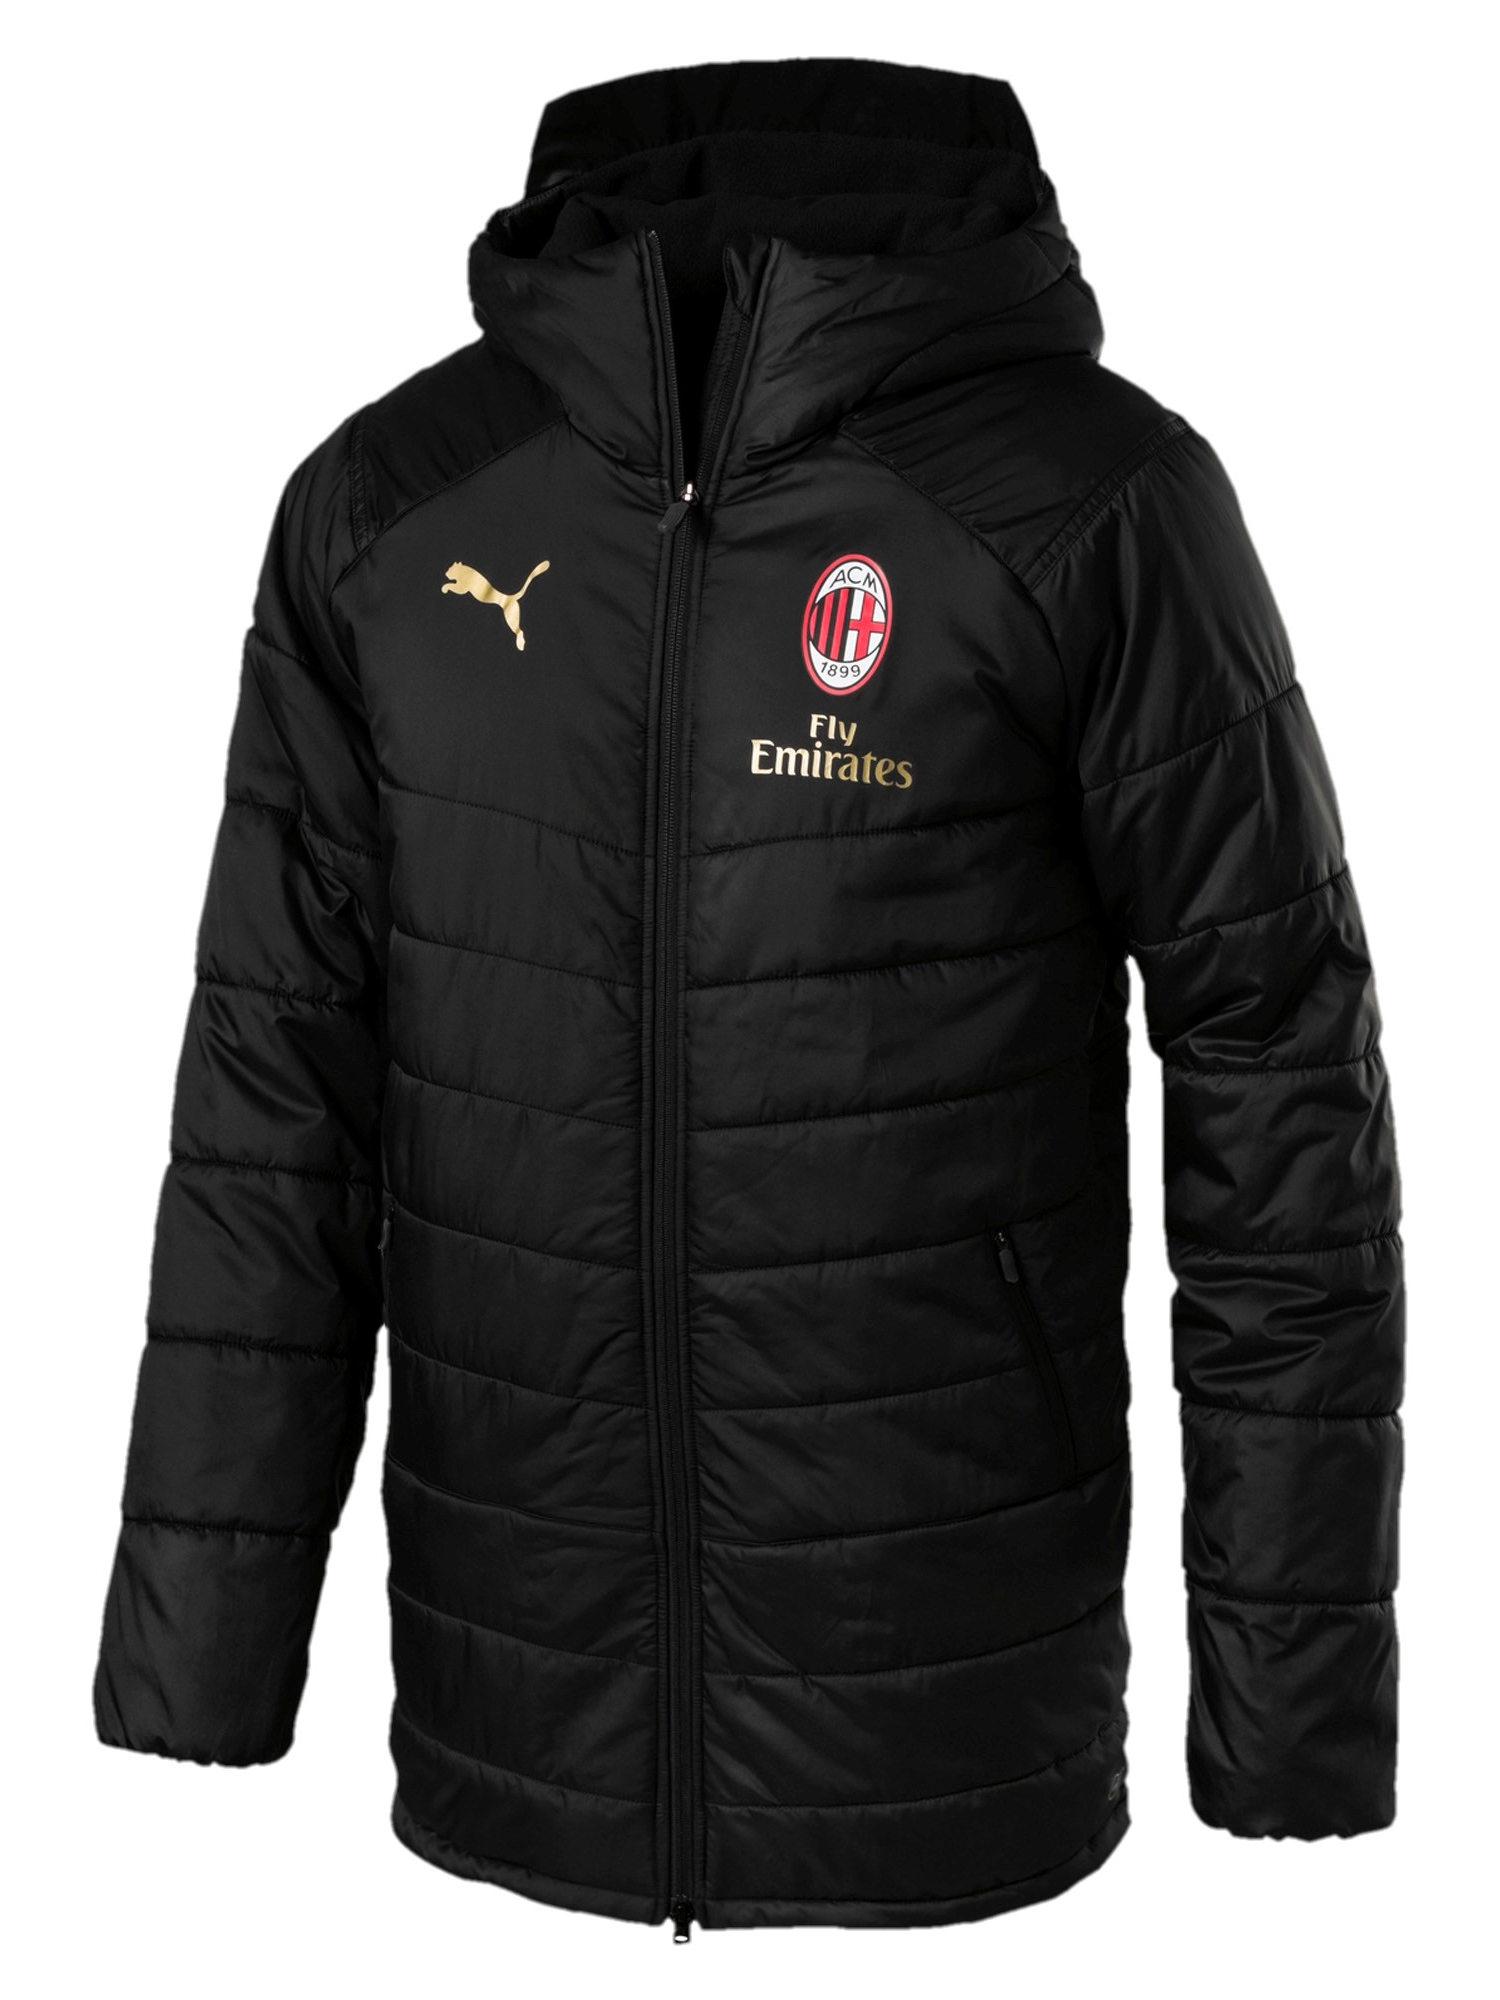 Disinteressato Ac Milan Puma Piumino Giubbotto Giaccone Long Jacket 2018 19 Versione Panchina